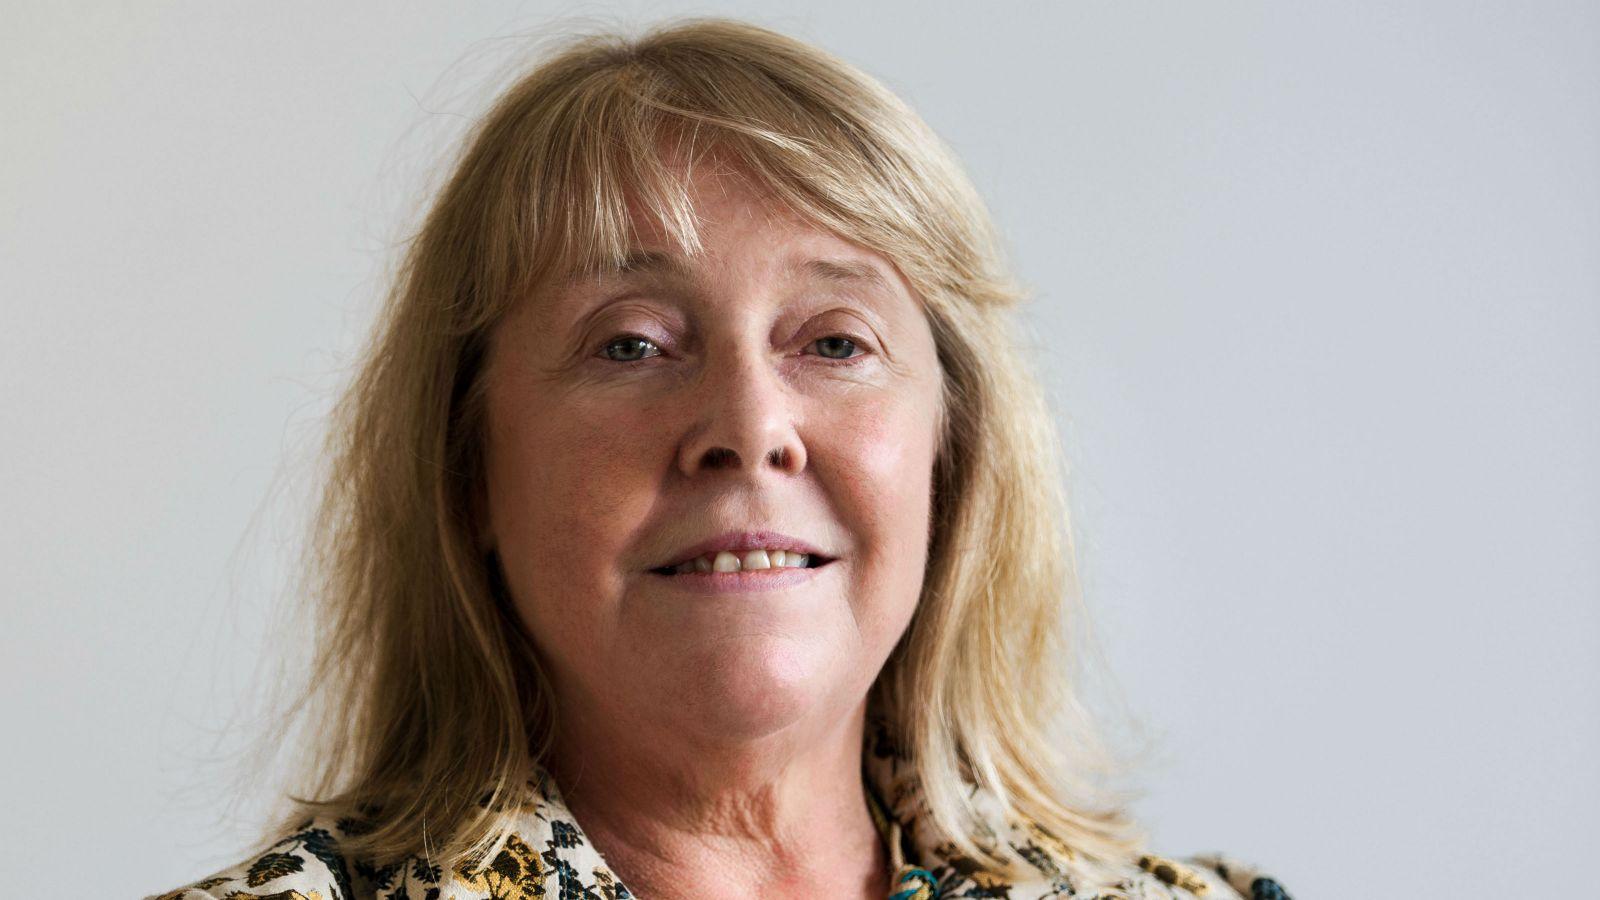 A portrait of Joanne Crawford